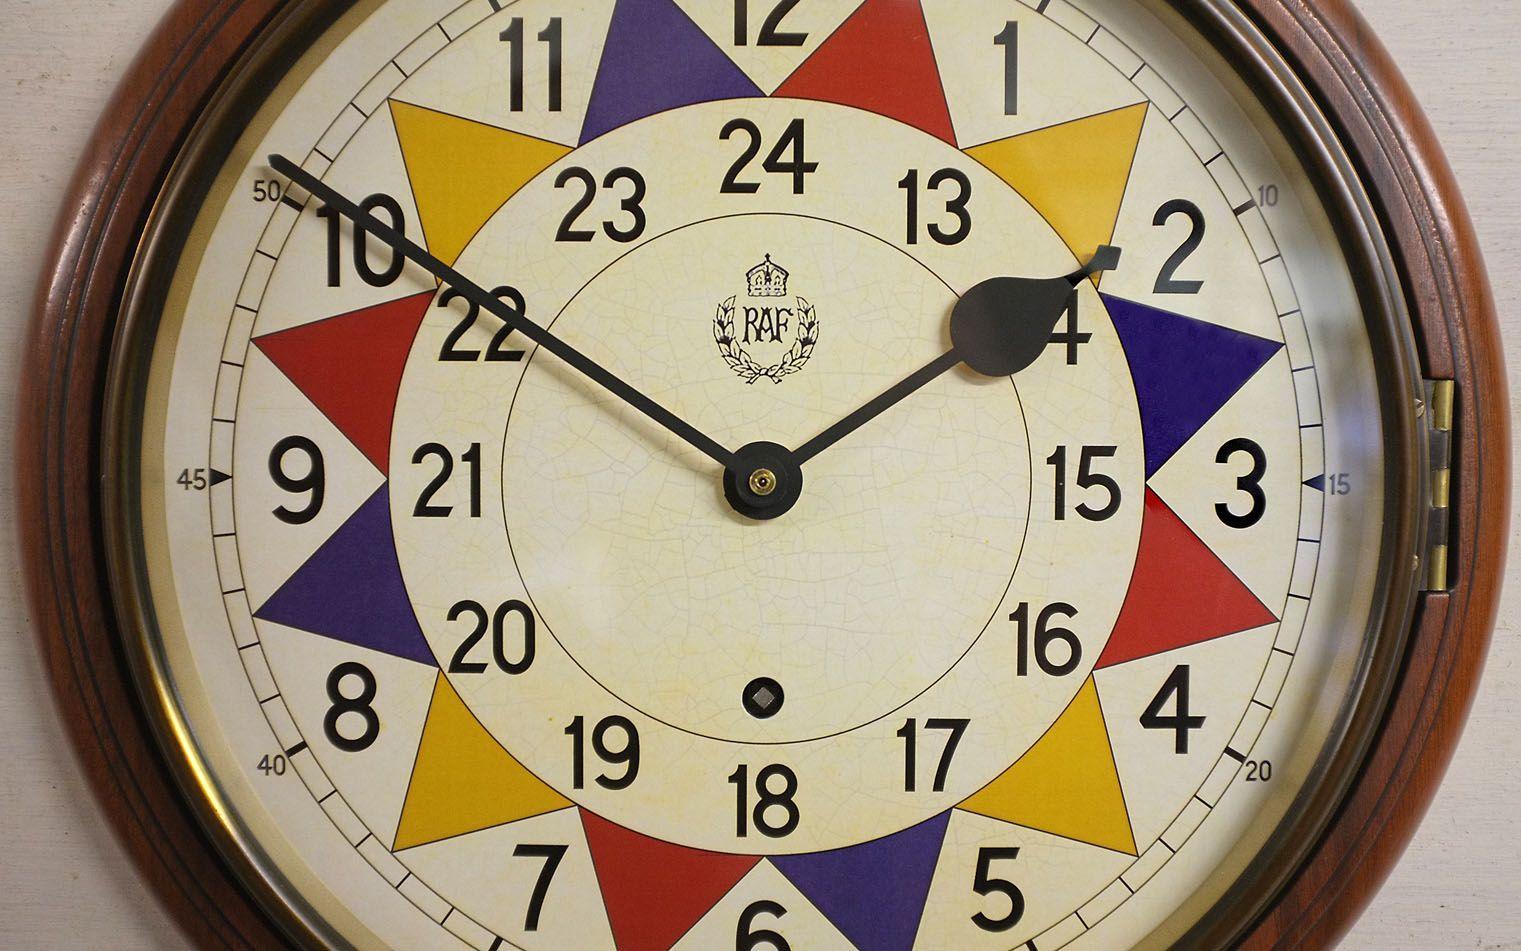 RAF Sector Wall Clock replica by Ellis & Co. Inside